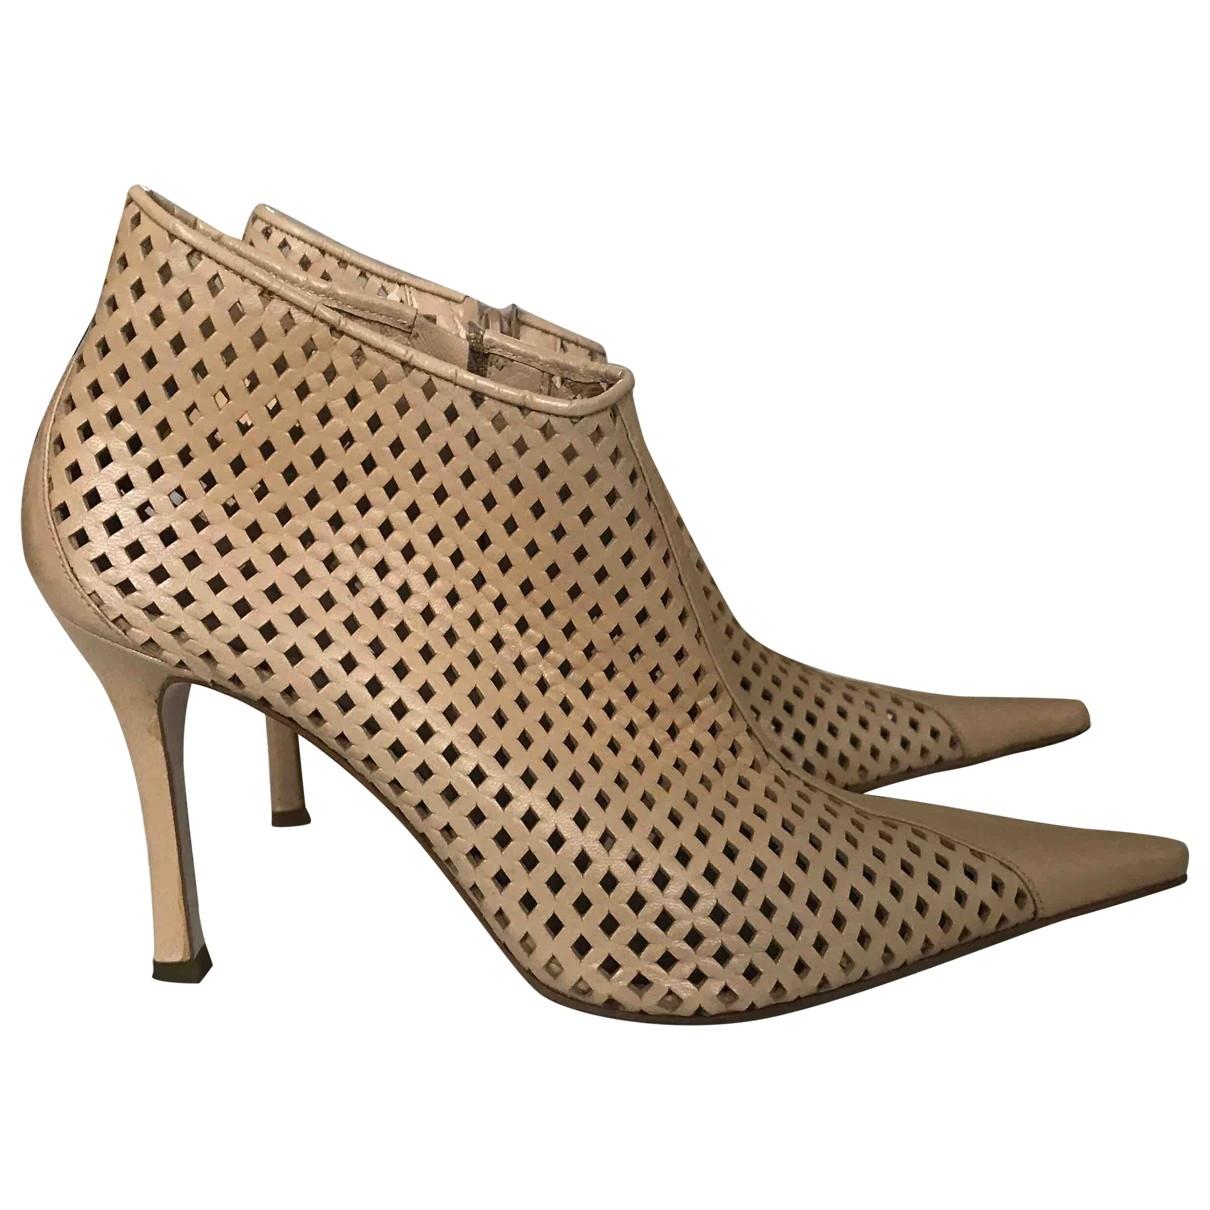 Zara - Boots   pour femme en cuir - beige